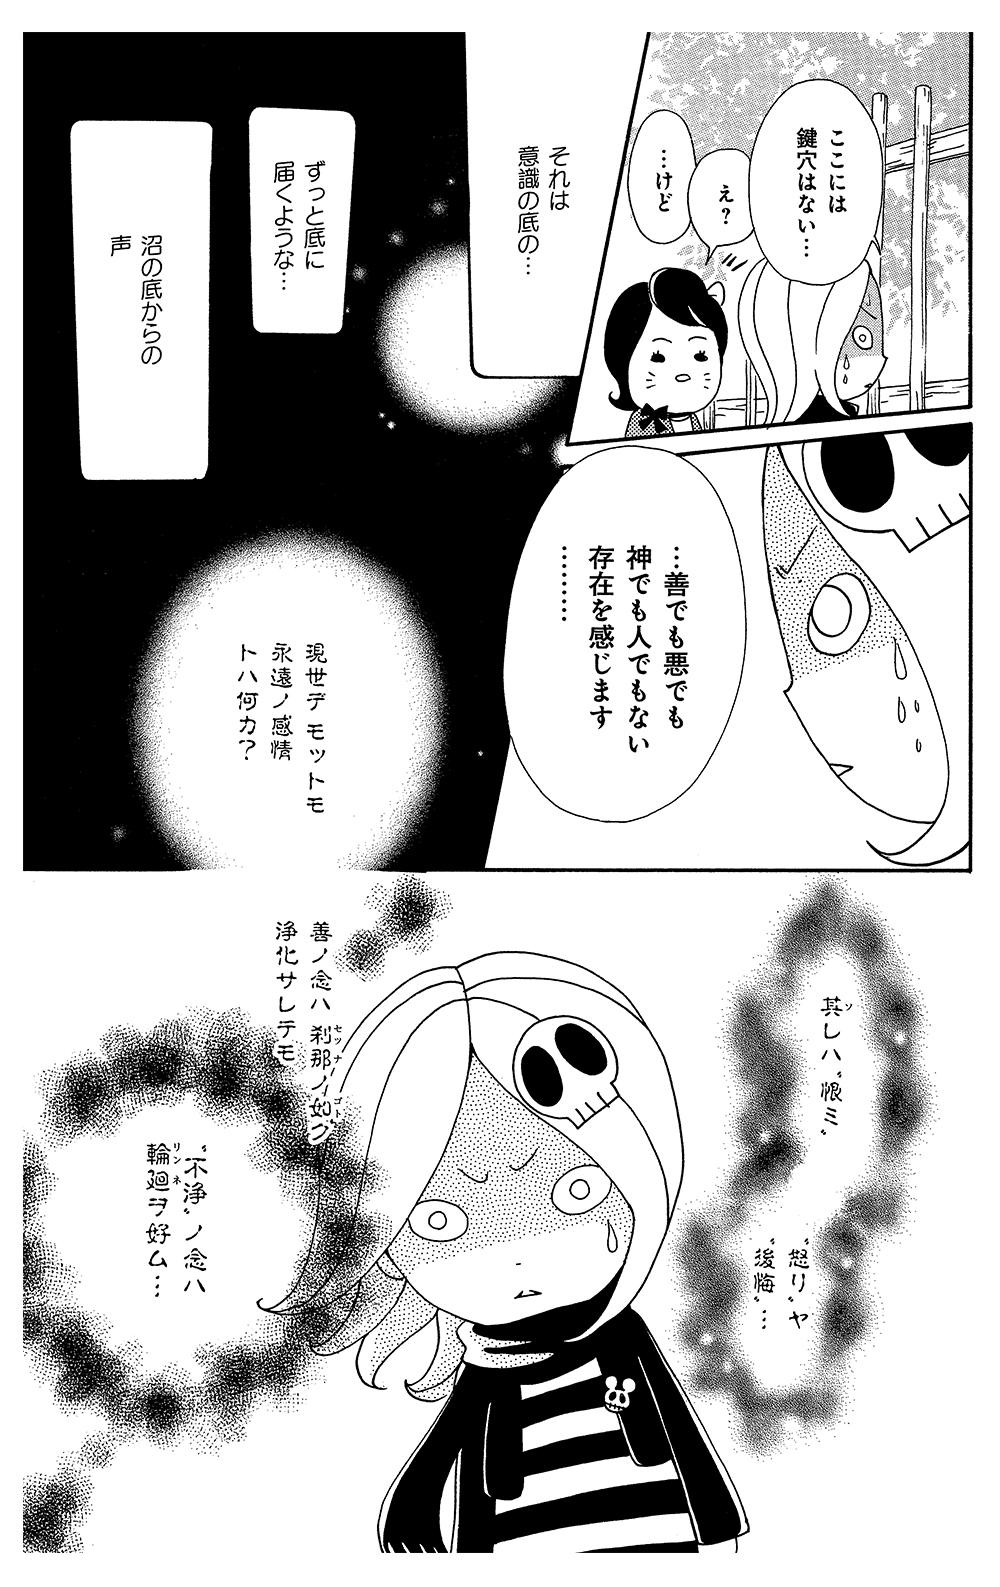 スピ☆散歩 第2話「清正井と明治神宮」②spsanp04-04.jpg